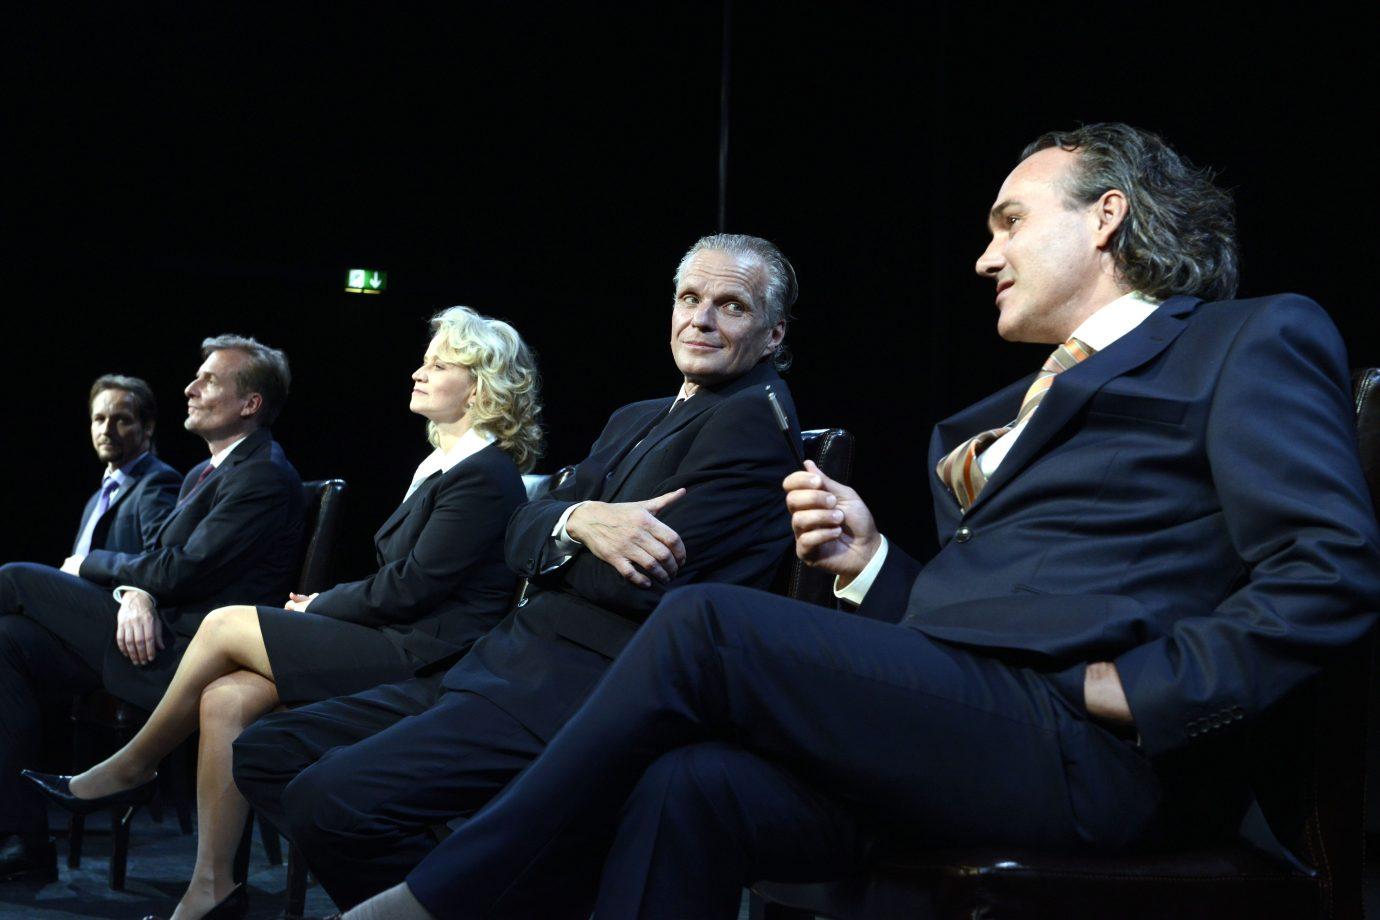 v.l. Maaß, Pohn, Kaminski, Ohmann, Bauer in DAS HIMBEERREICH © Bettina Müller